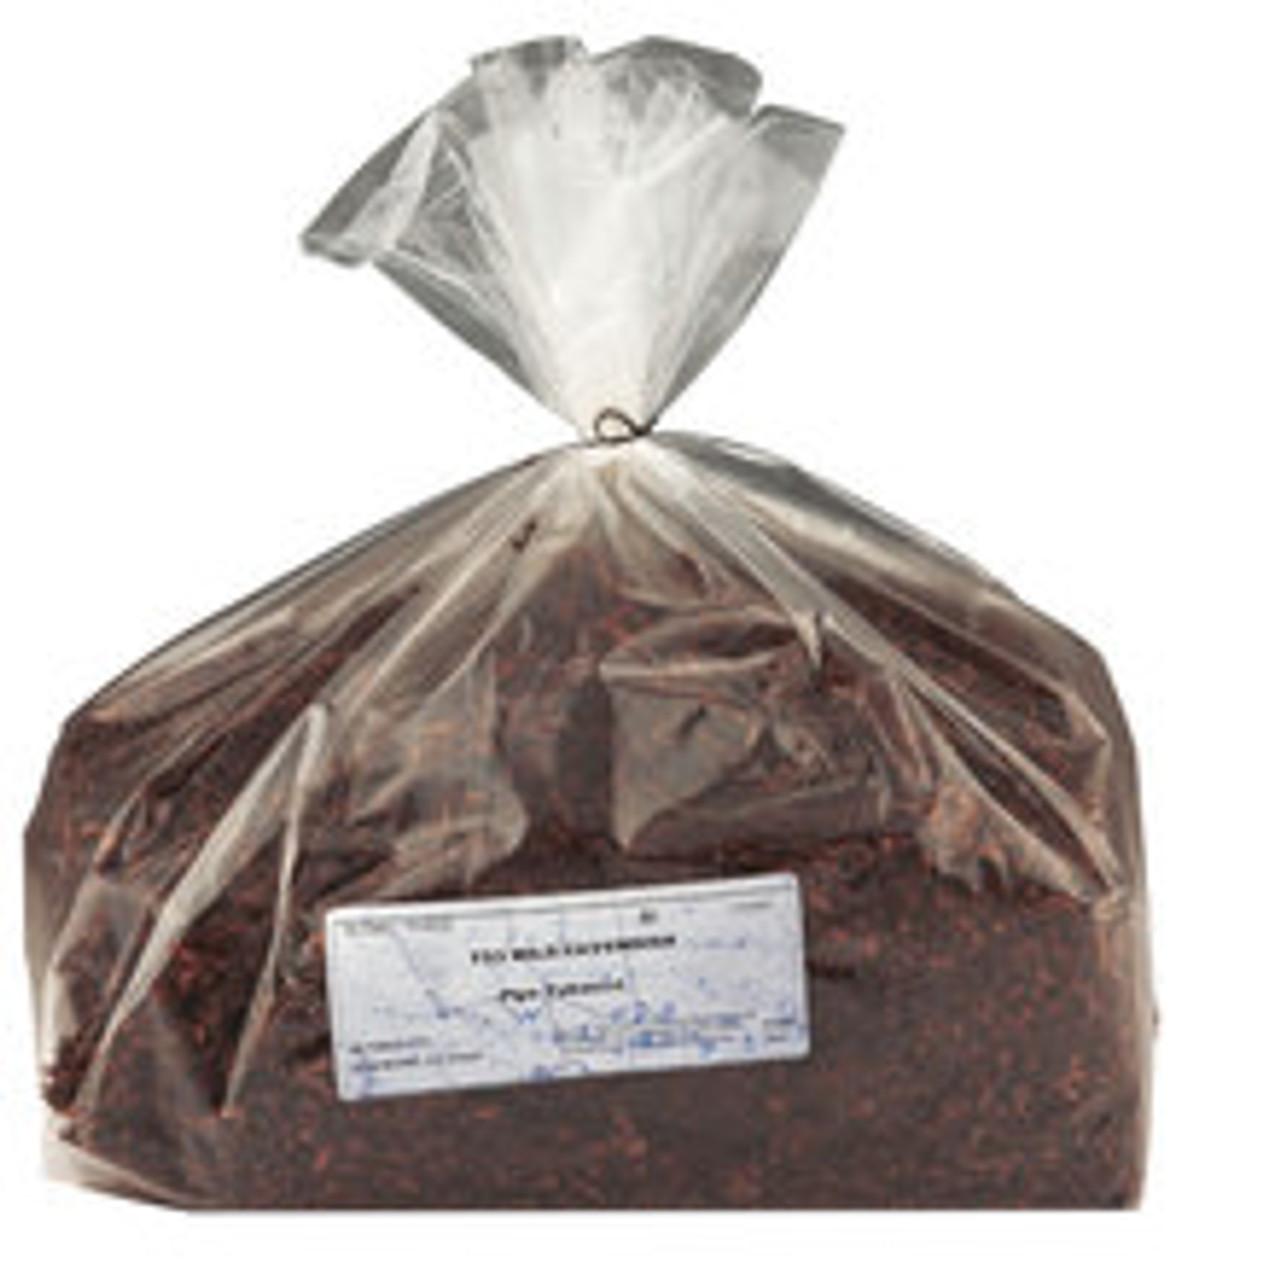 Sutliff 504 Aromatic English Bulk Pipe Tobacco 5 LB